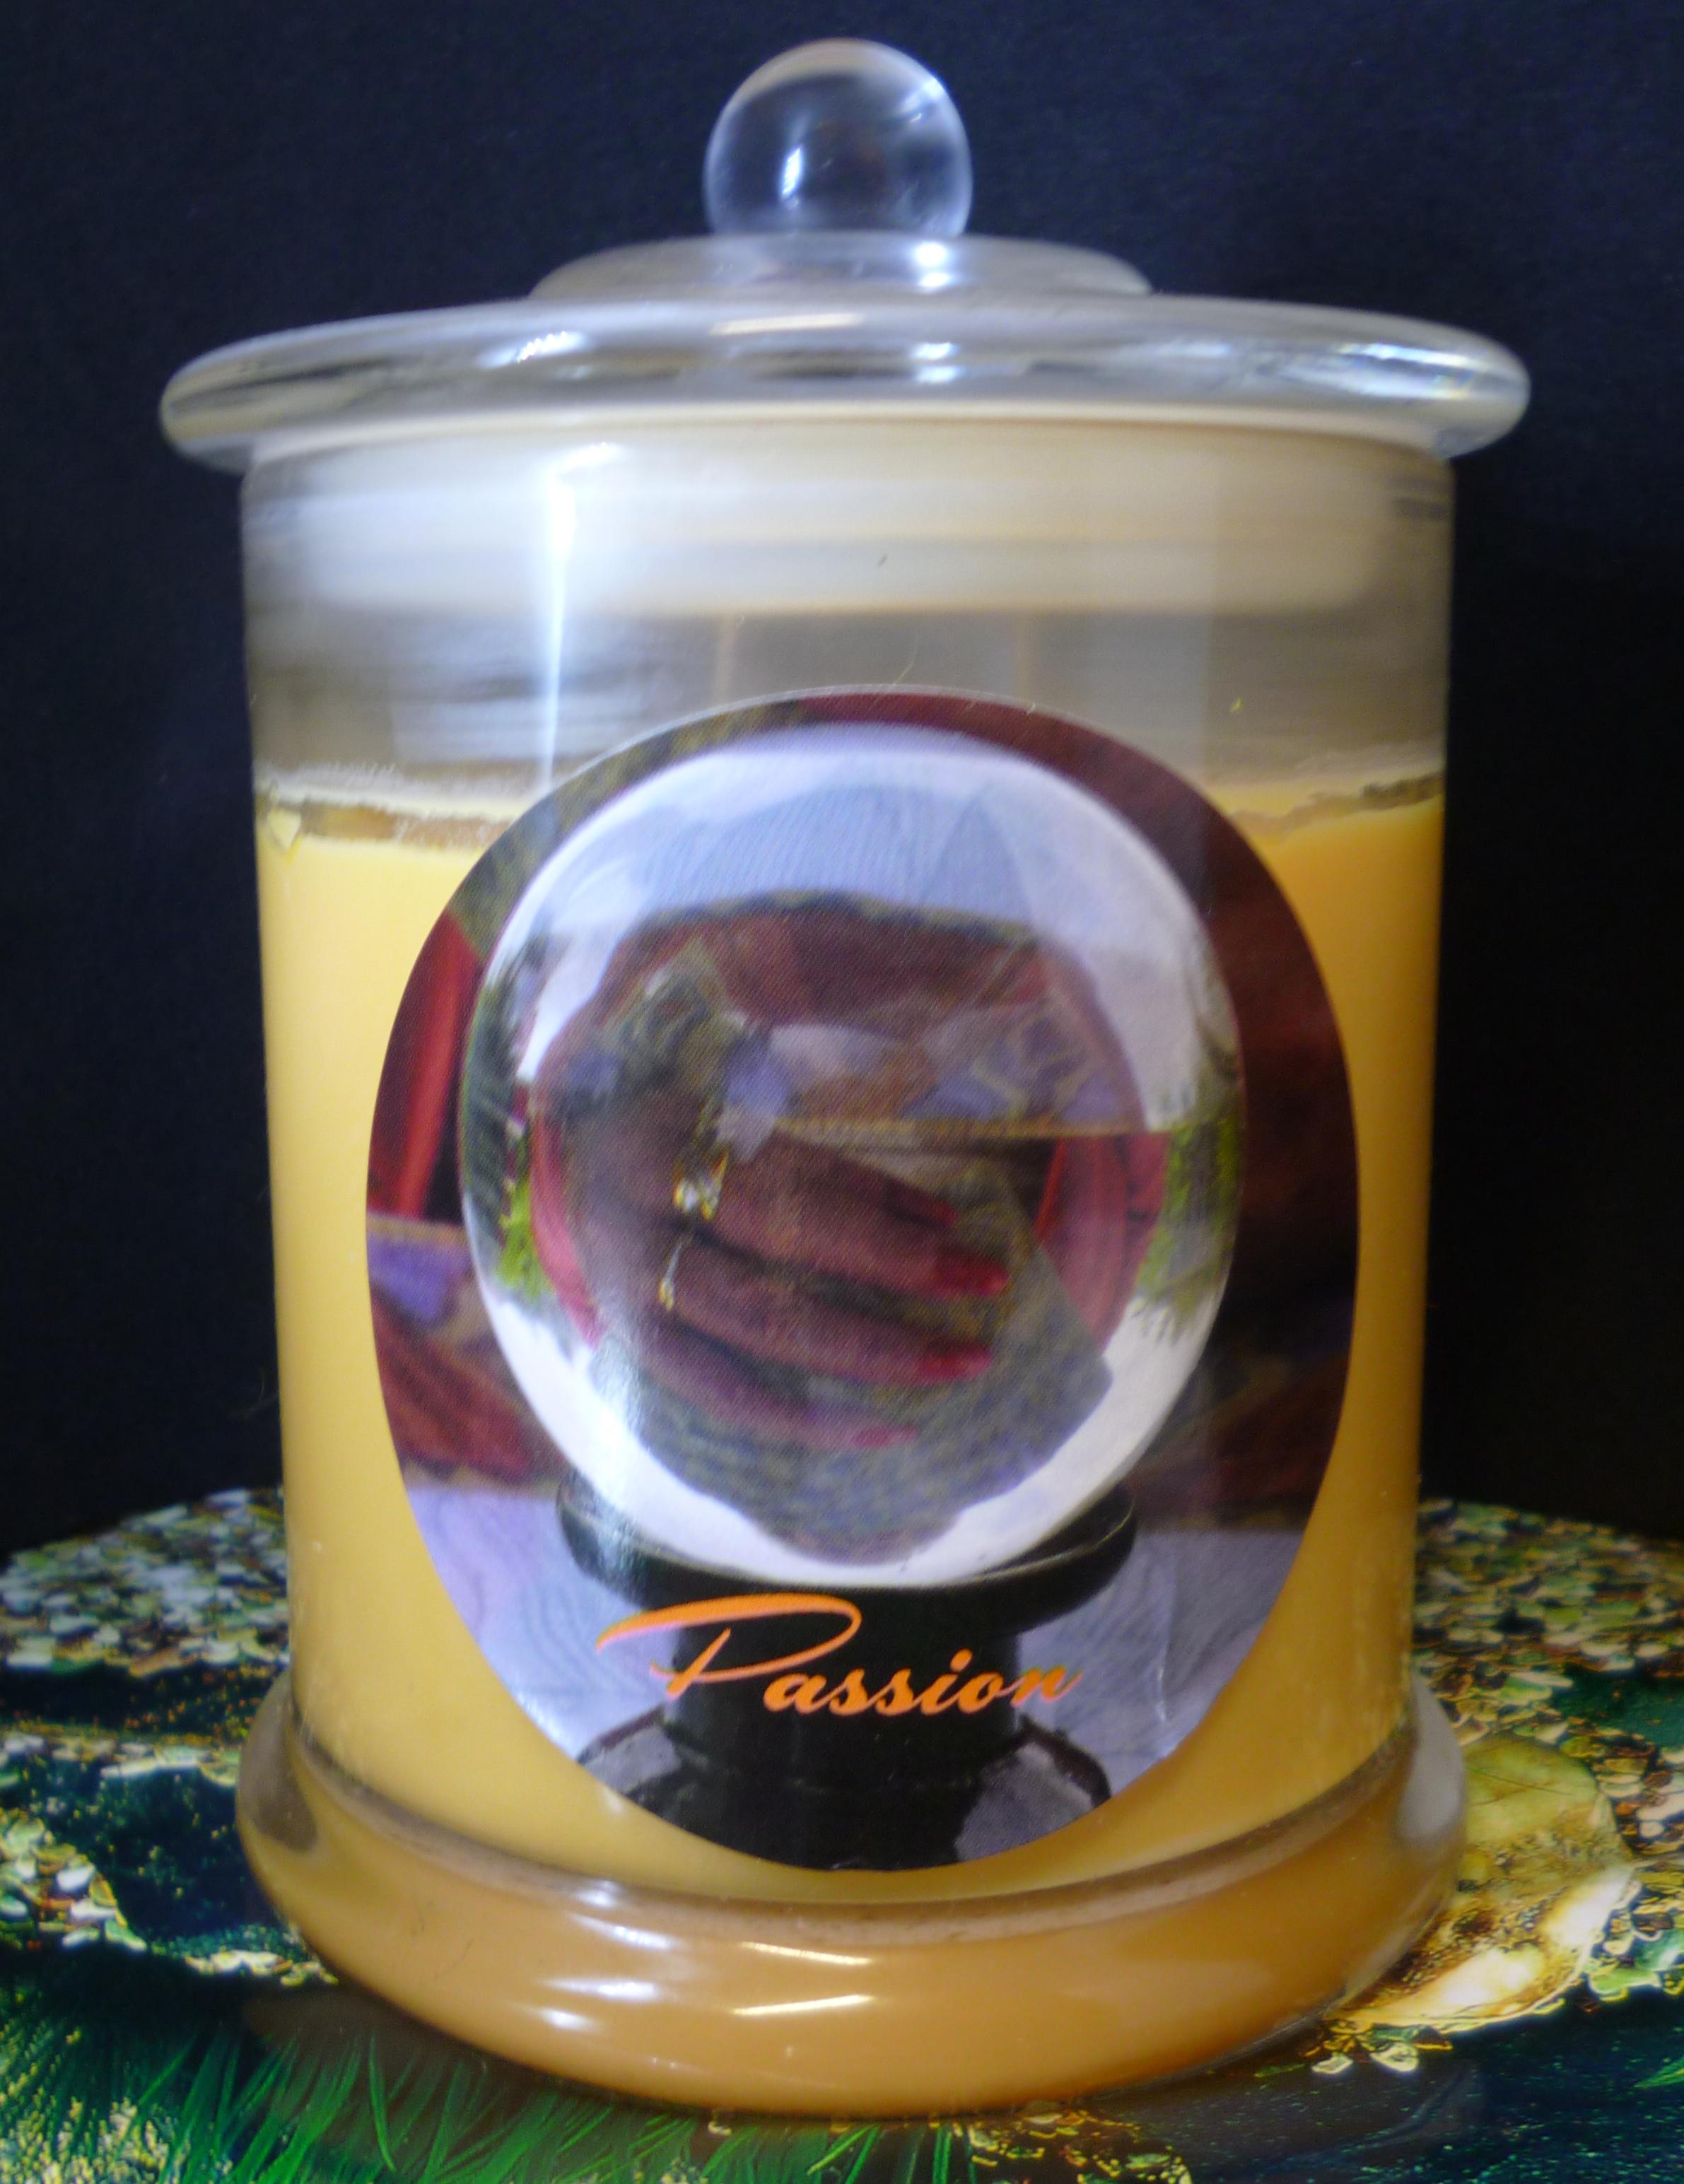 Passion-XLarge-candle